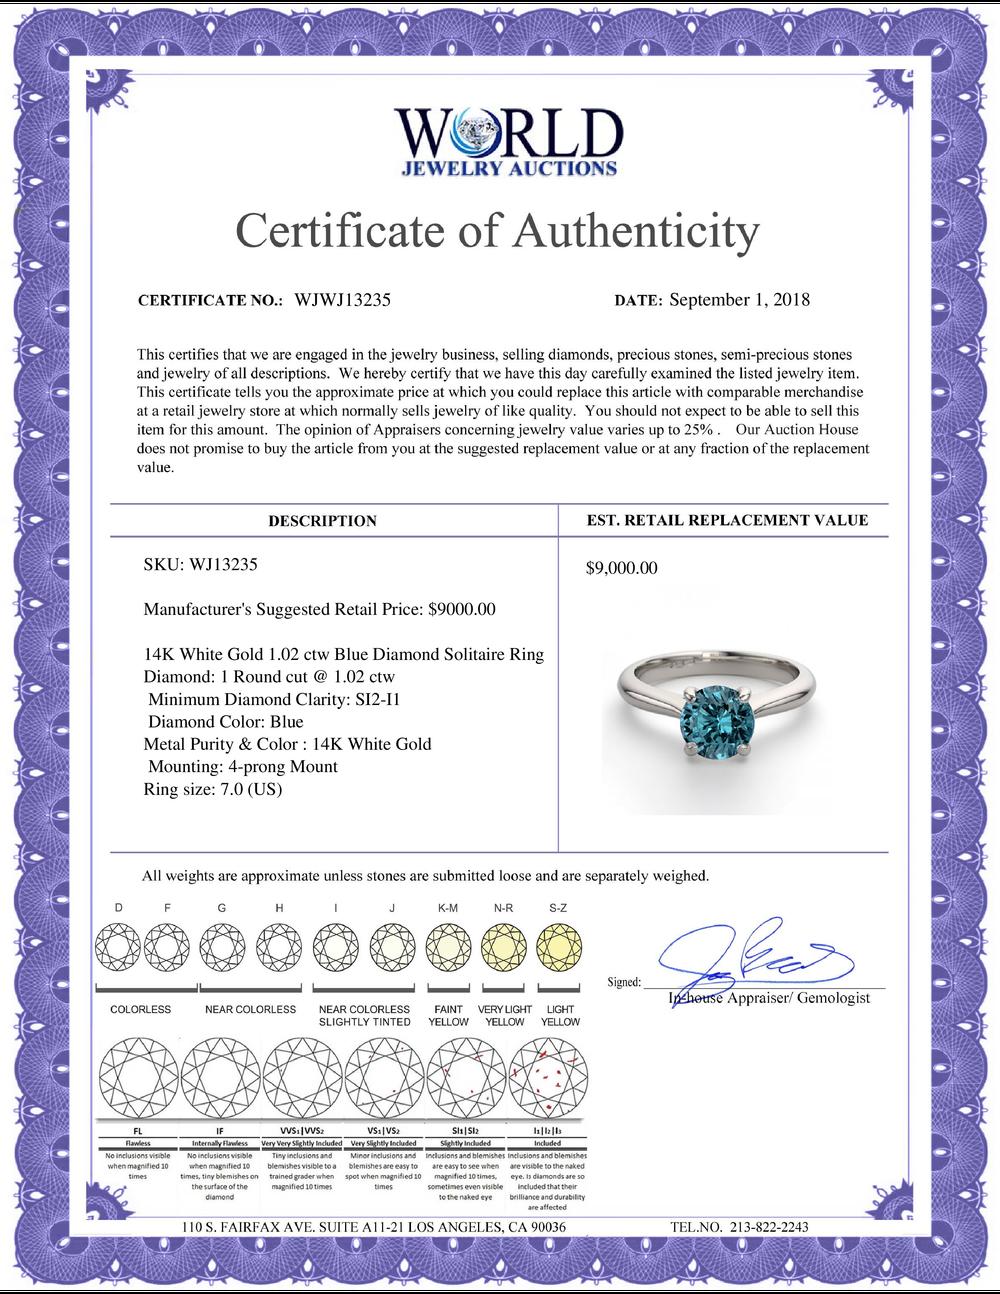 Lot 4192: 14K White Gold 1.02 ctw Blue Diamond Solitaire Ring - REF-173N5W-WJ13235